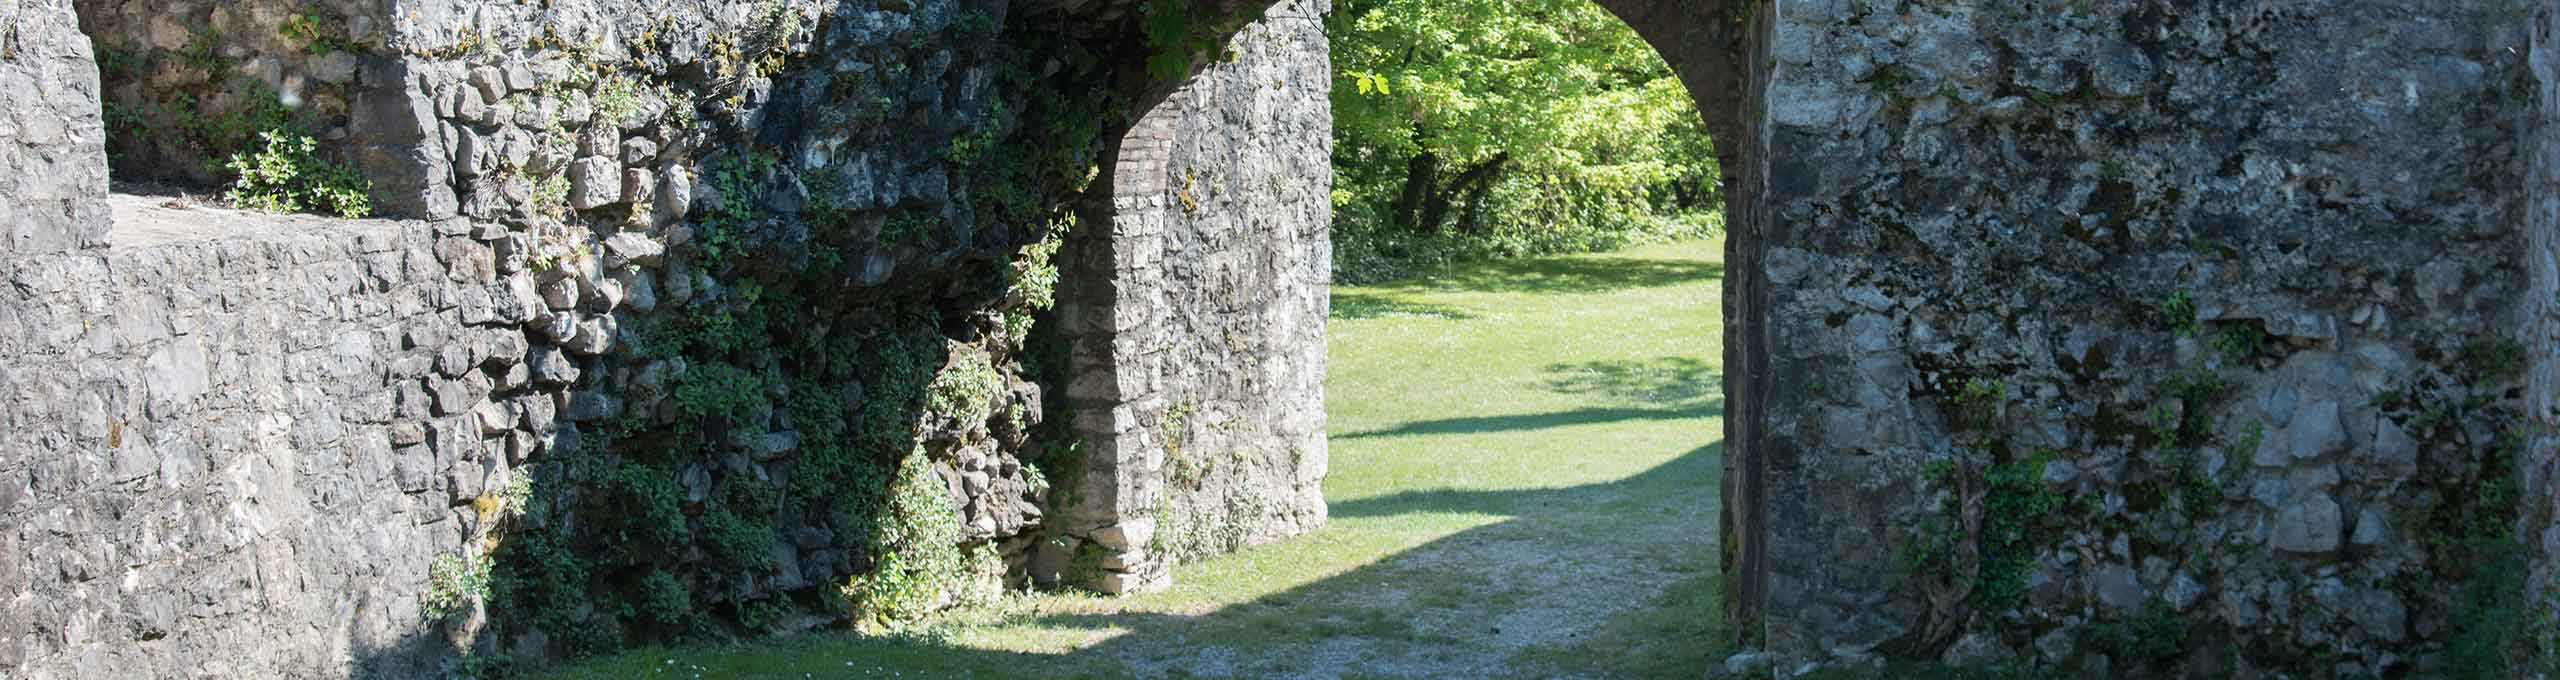 Gradisca D'Isonzo, Gorizia, antica fortezza